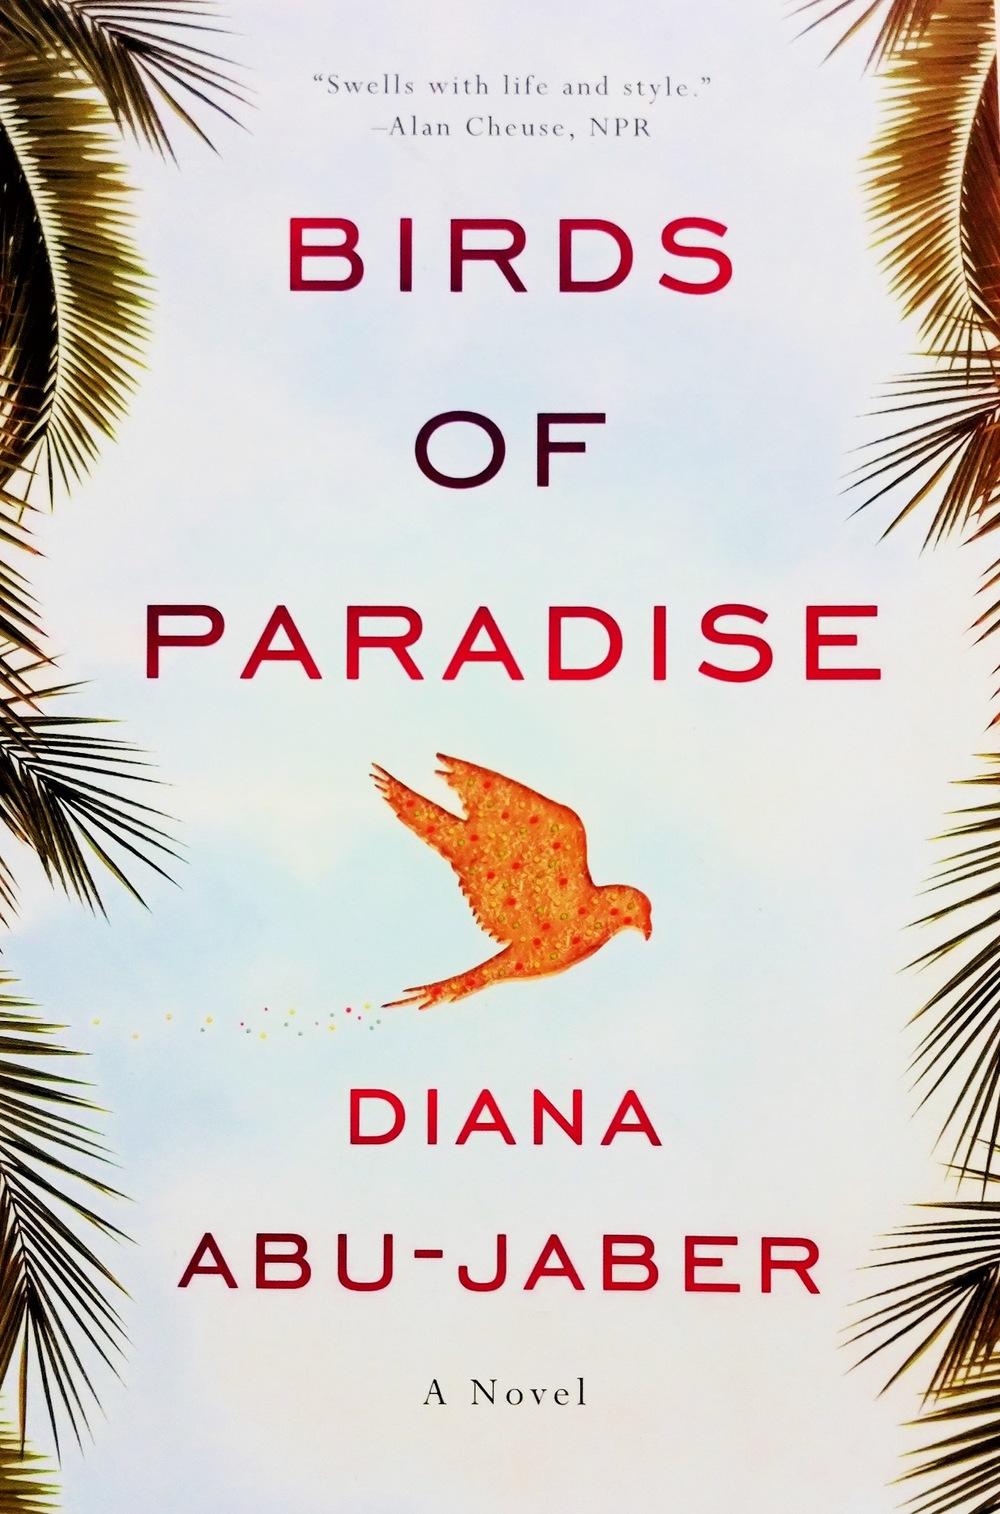 birdparadise.jpg